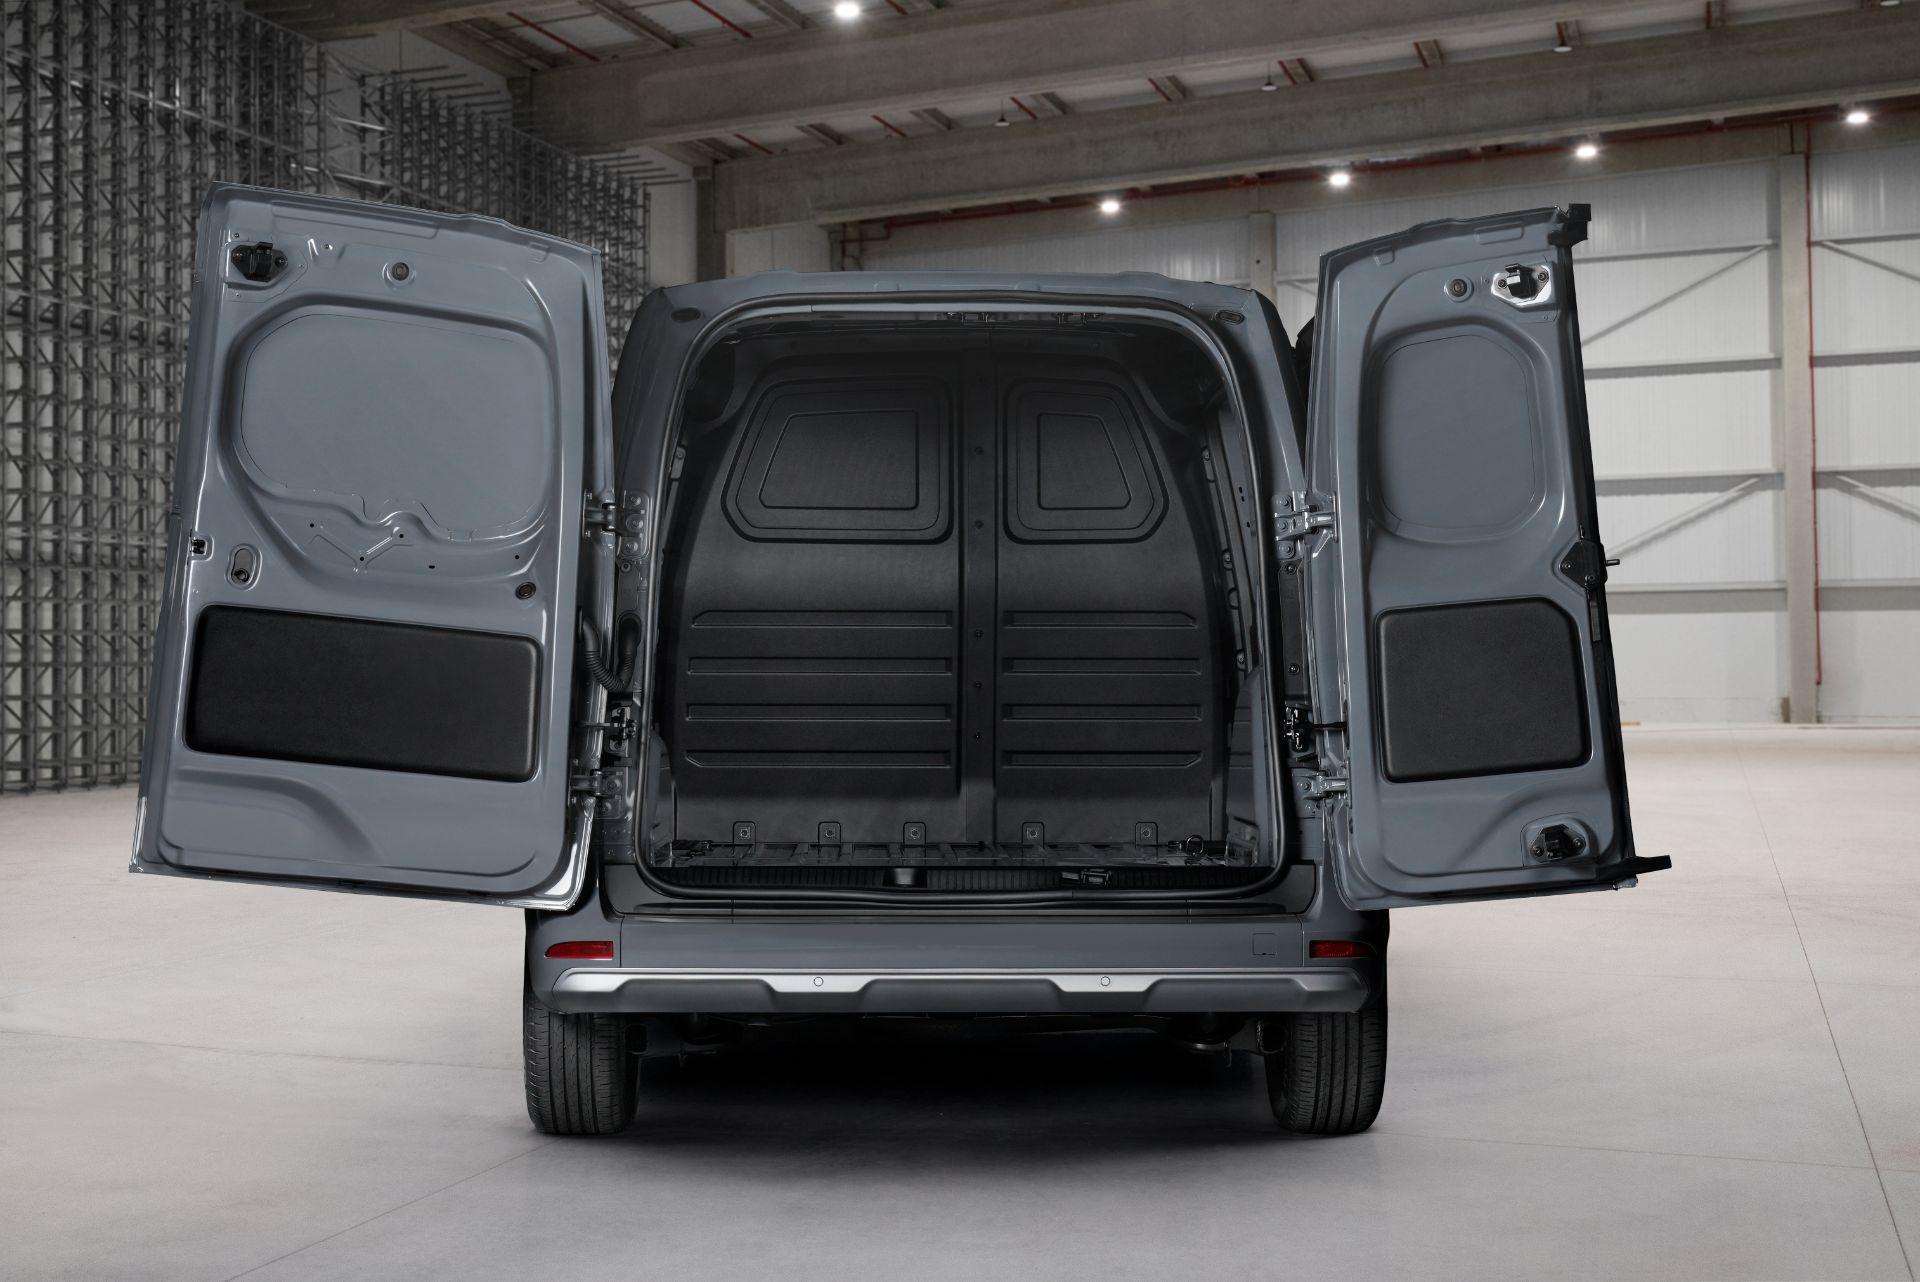 2022-Nissan-Townstar-petrol-van-dynamic-24